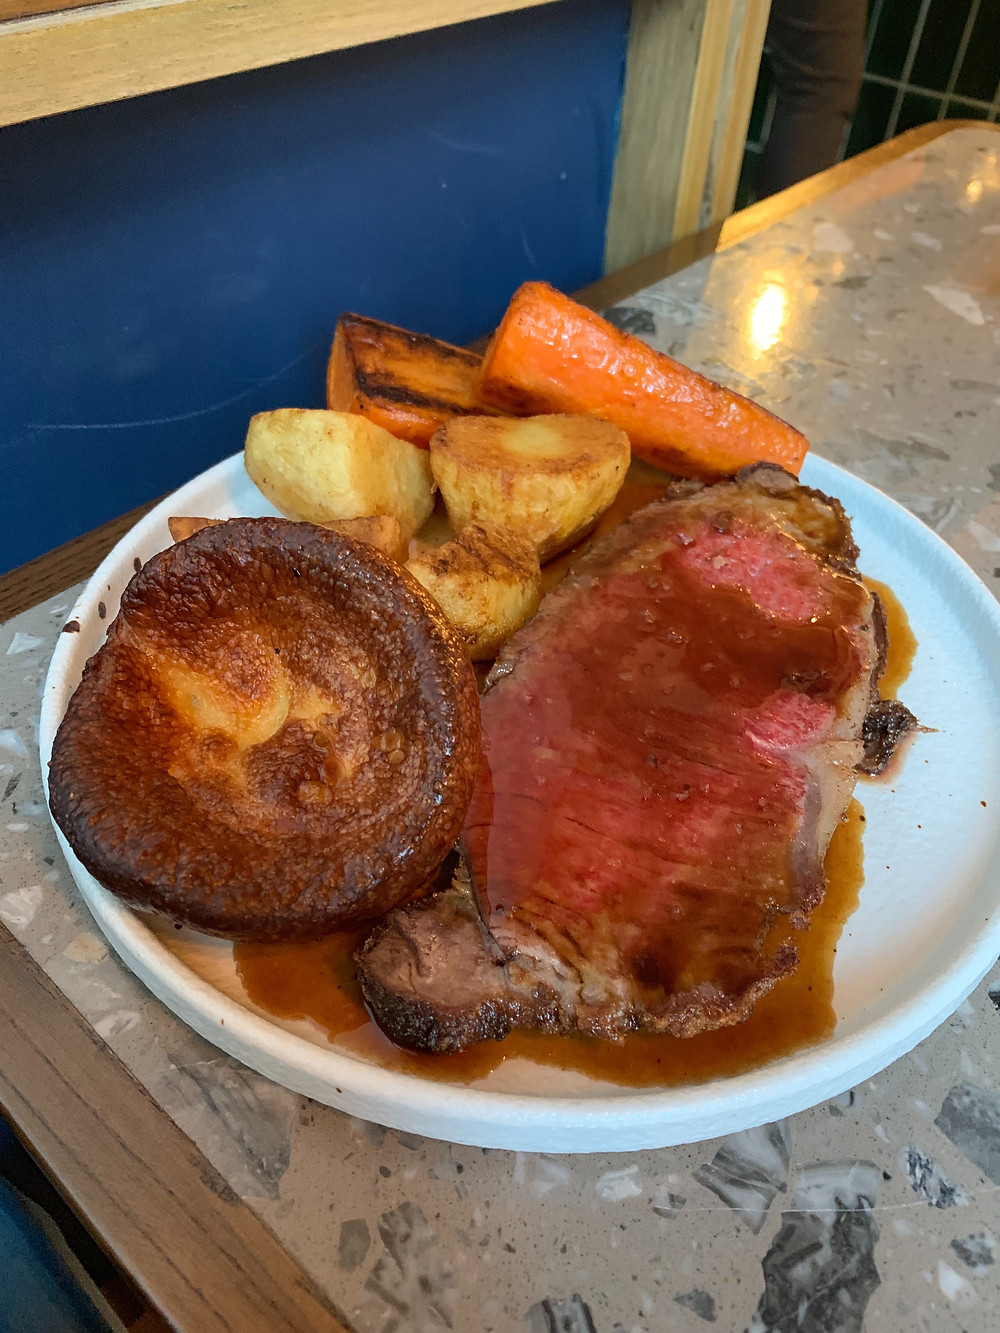 Sunday roast at Brunch at Kinship restaurant in Hong Kong